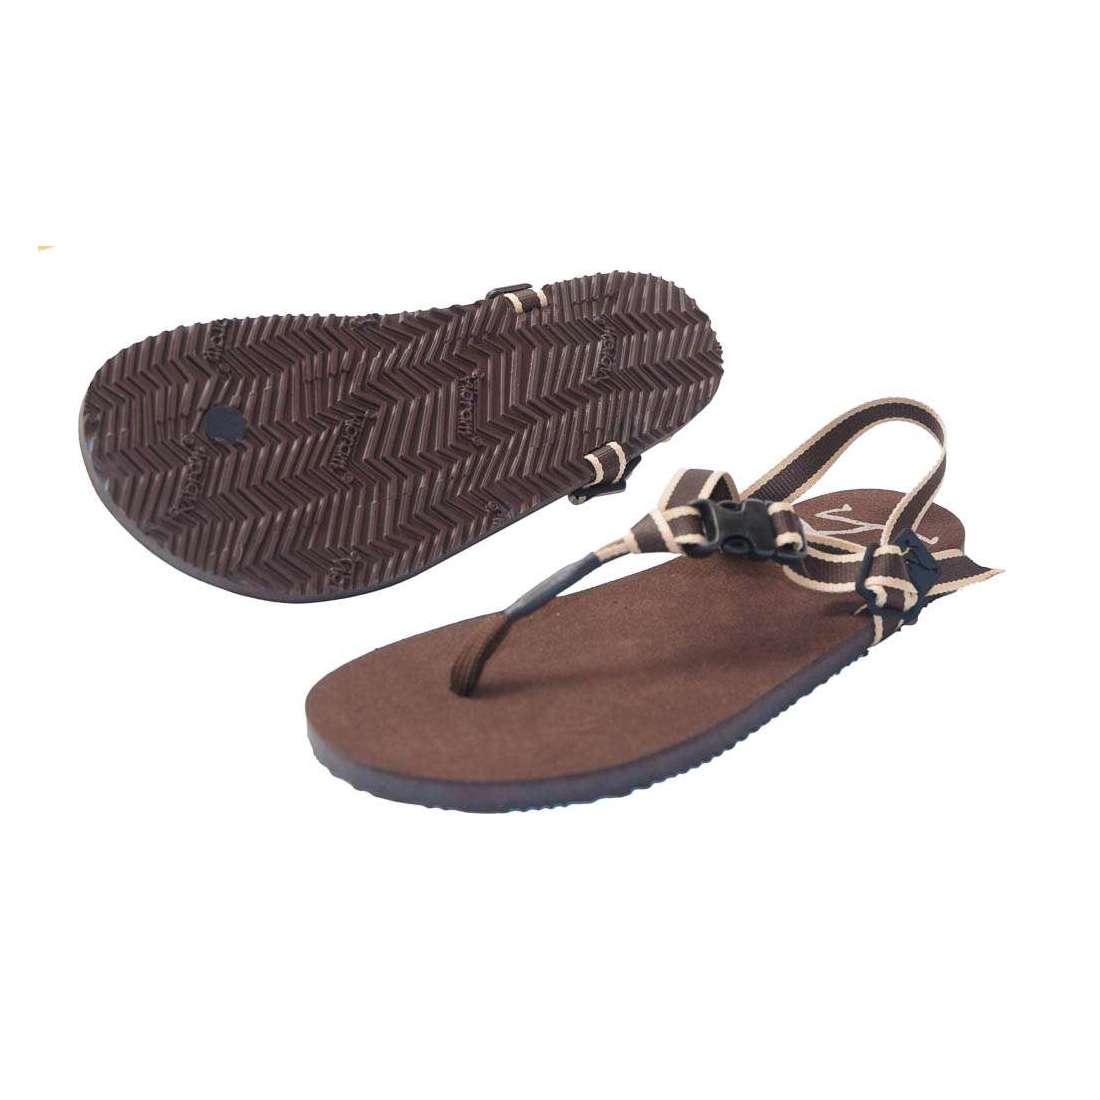 8622ed87430d Minimal Sandals Sandalia Huarache Vibram Deporte Correr Barefoot 40 ...